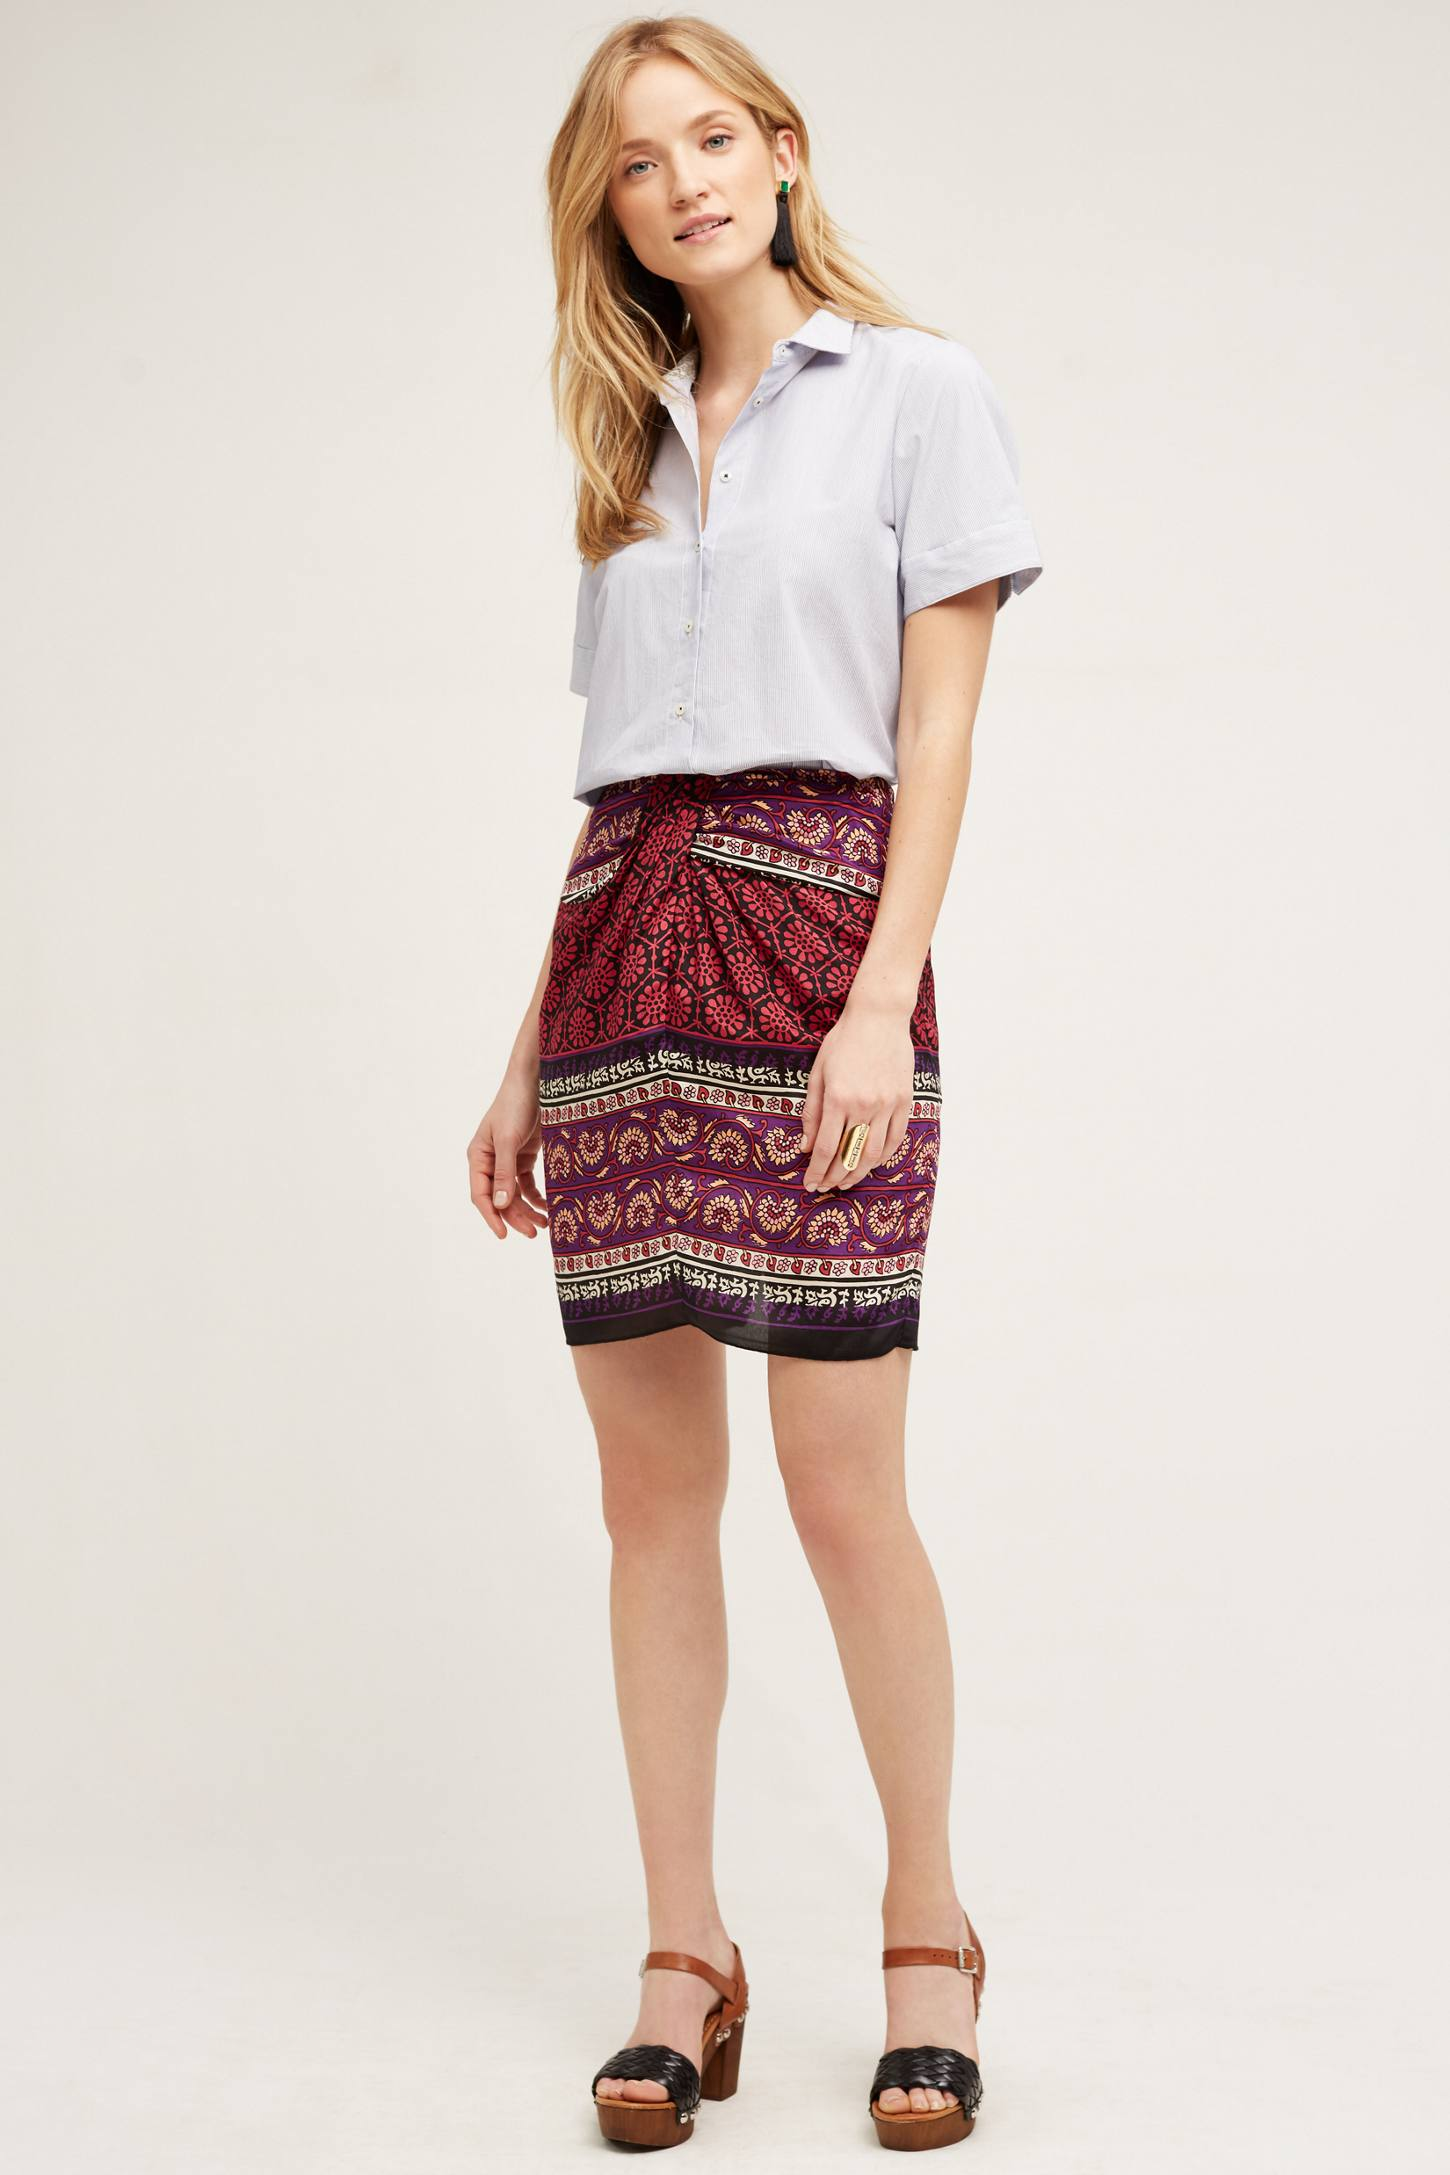 r-burgundy-mini-skirt-white-top-studs-wear-style-fashion-spring-summer-print-cognac-shoe-sandalh-blonde-lunch.jpg